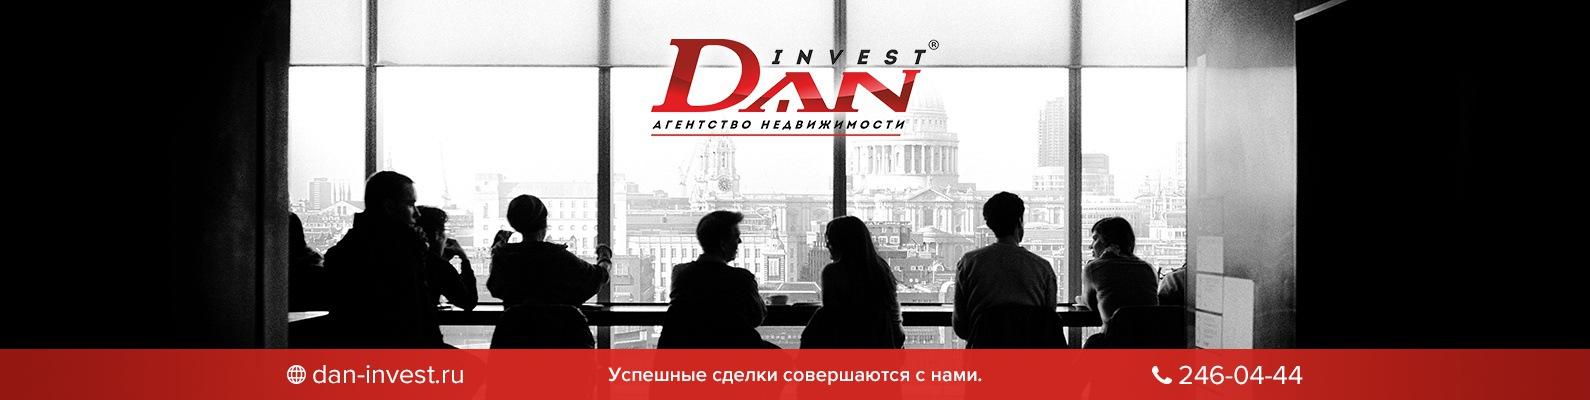 b67132bafb903 Агентство недвижимости Дан-Инвест | ВКонтакте